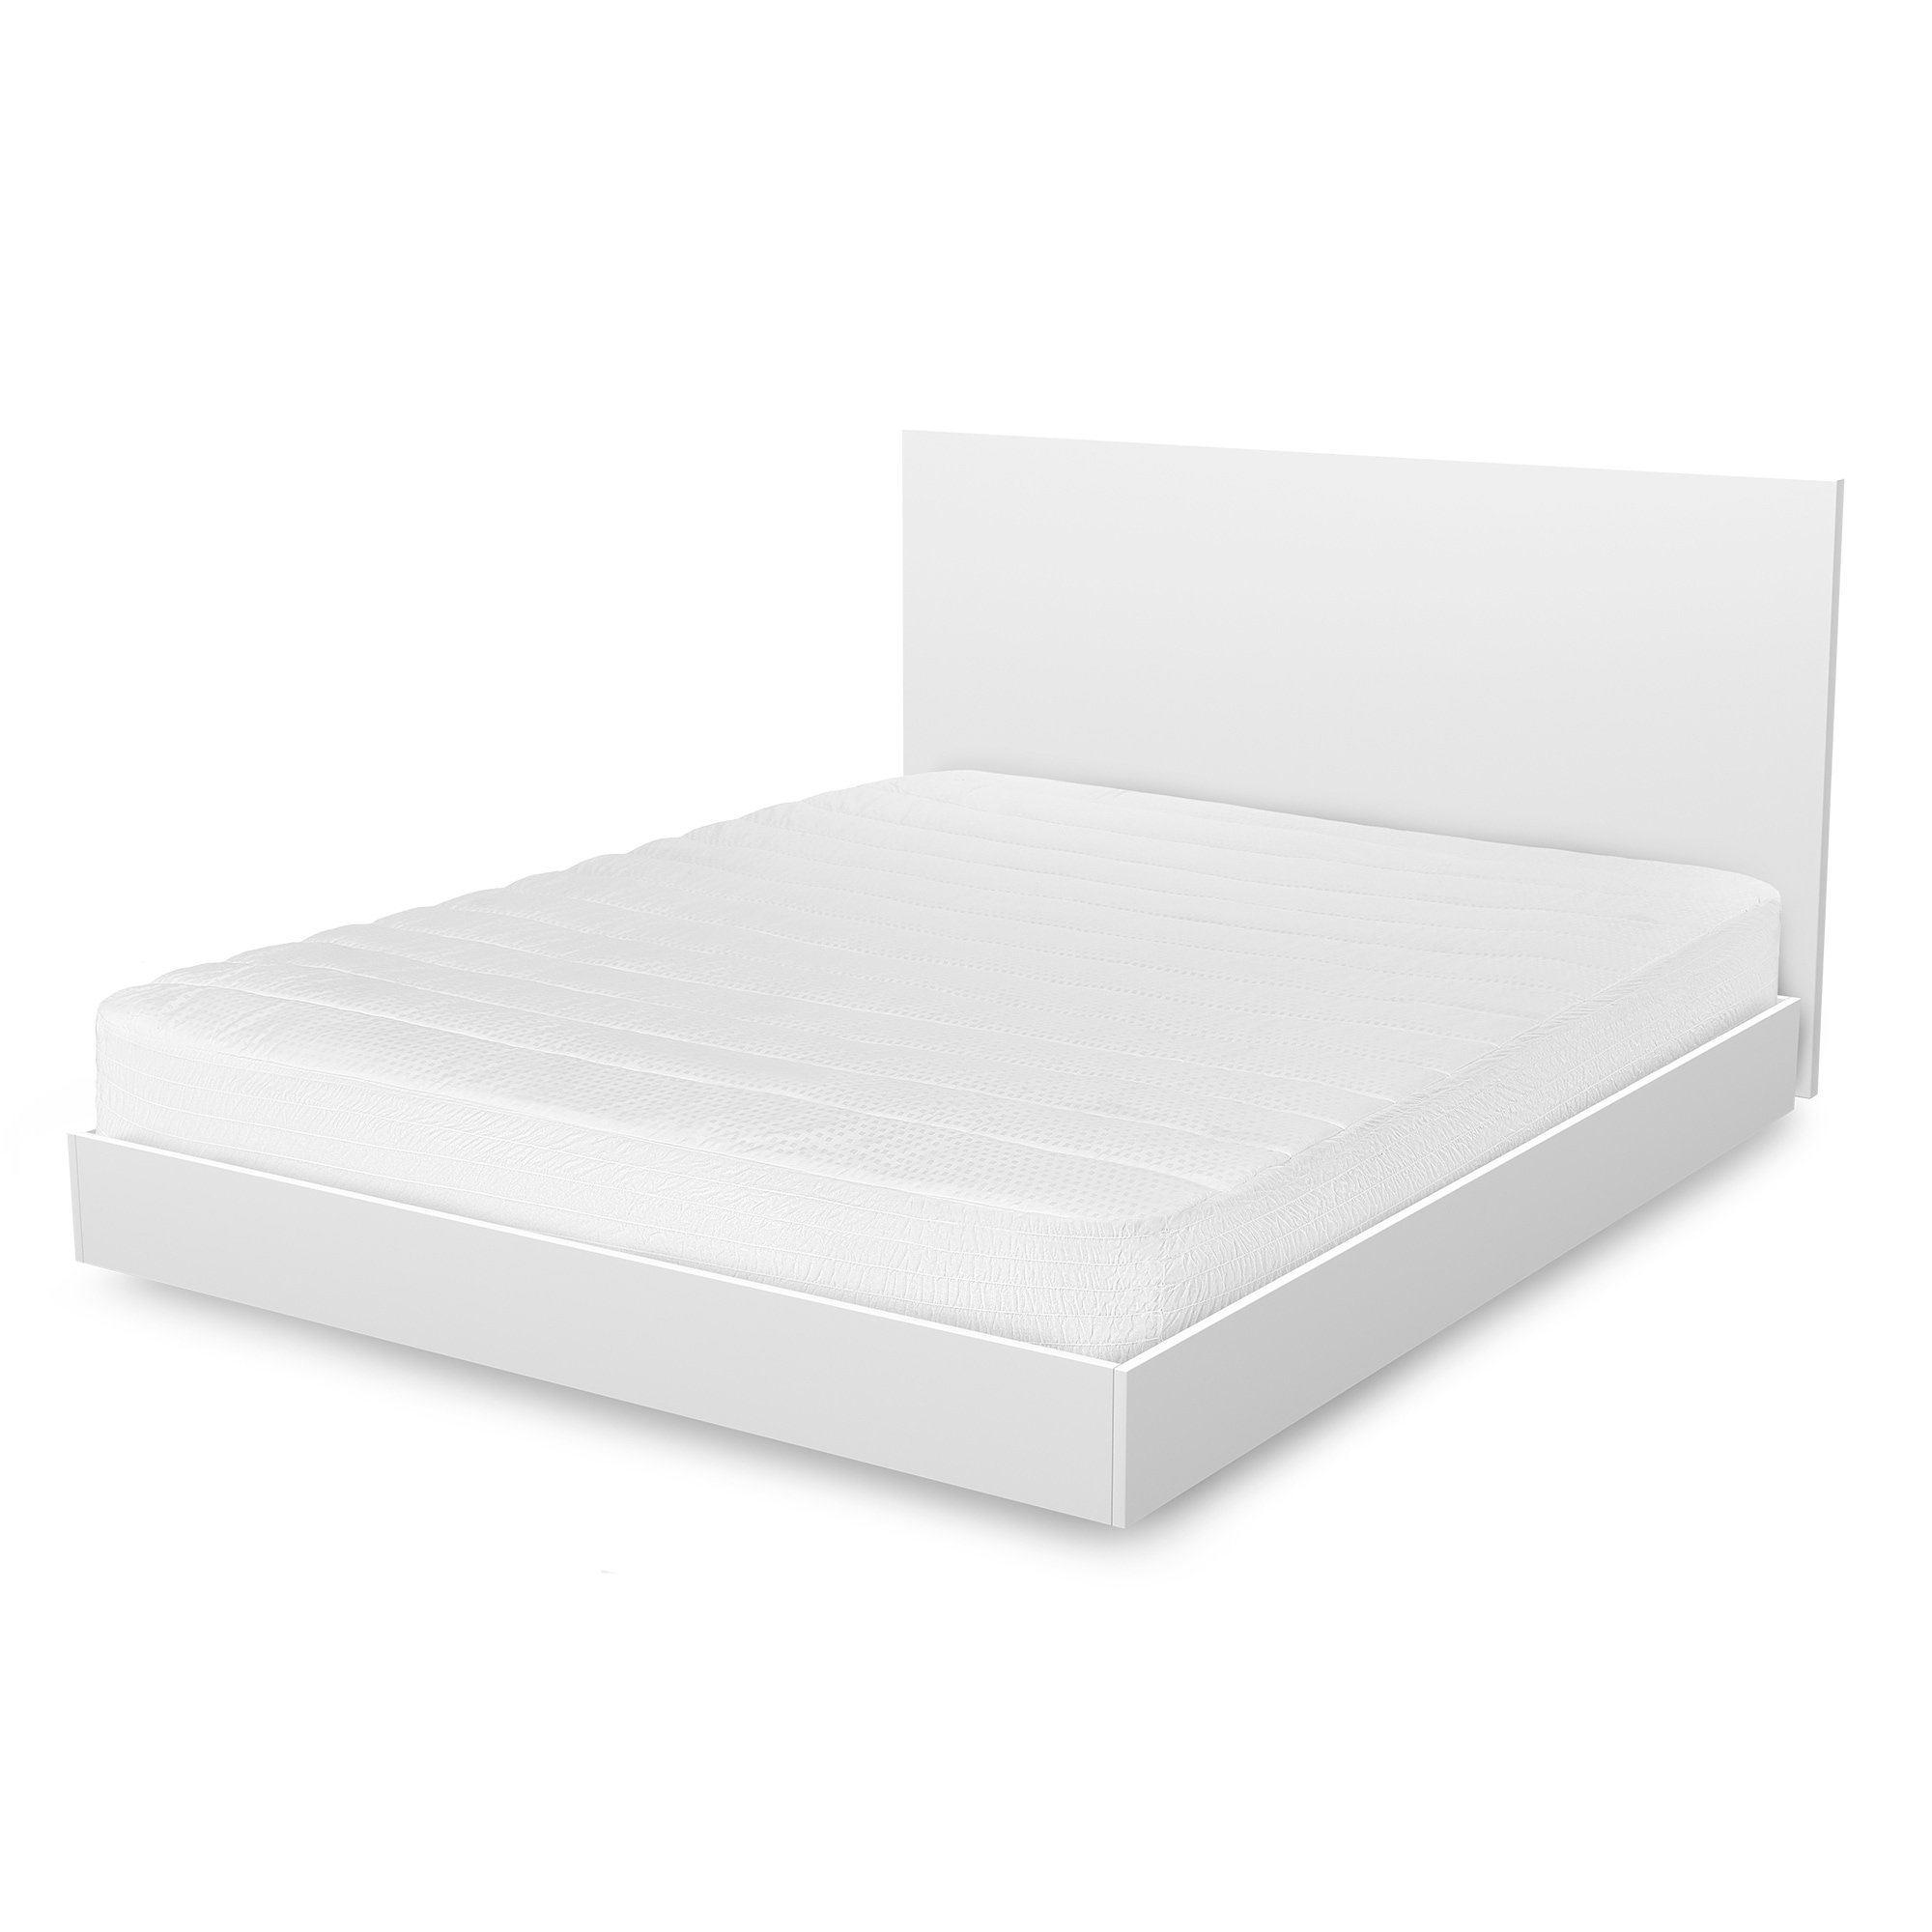 Hotel Madison 400 Thread Count Pima Cotton Mattress Pad - White Twin